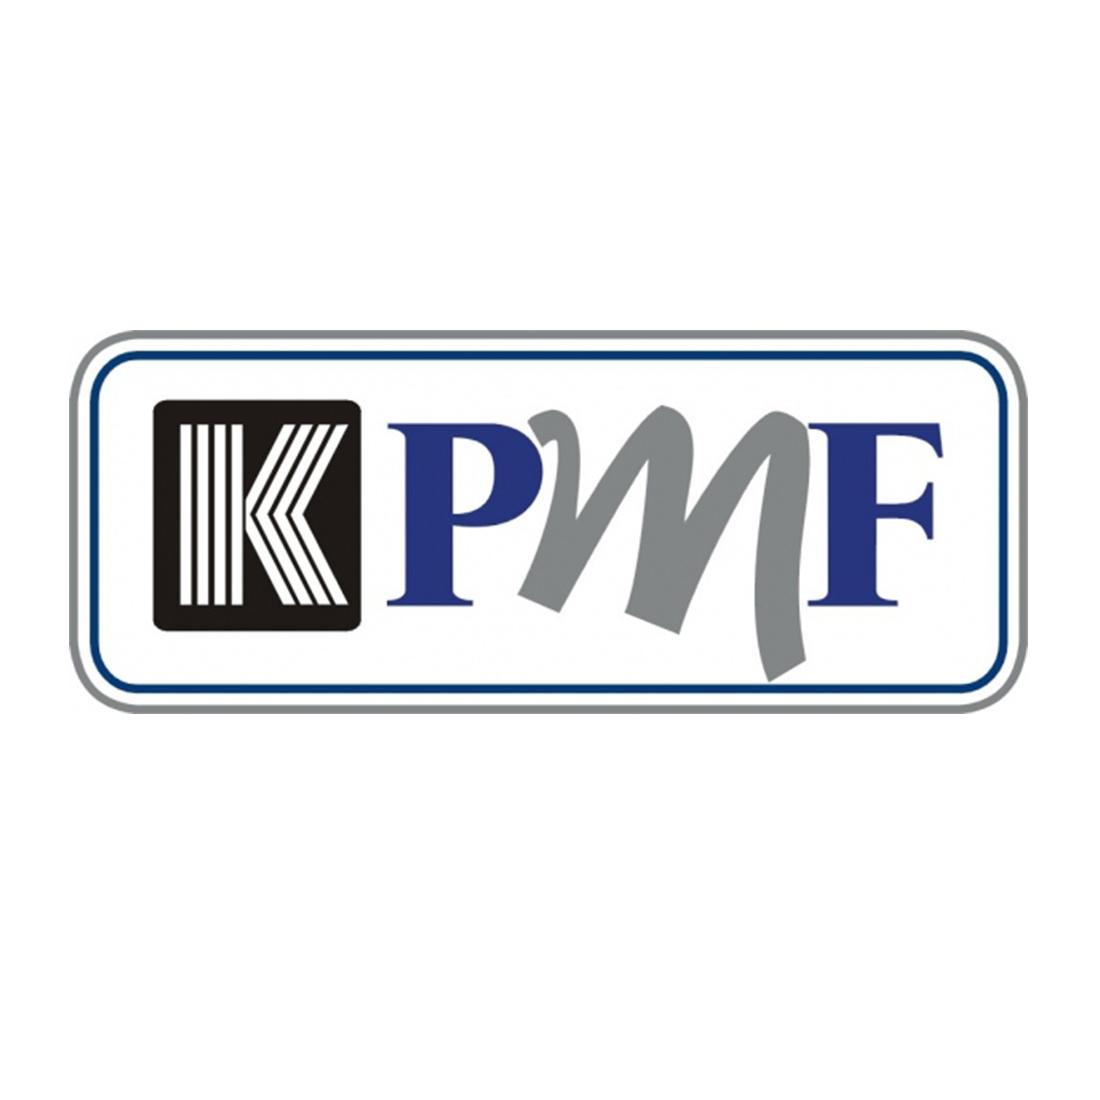 KPMF K52001 / K51001 / Schutzlaminate